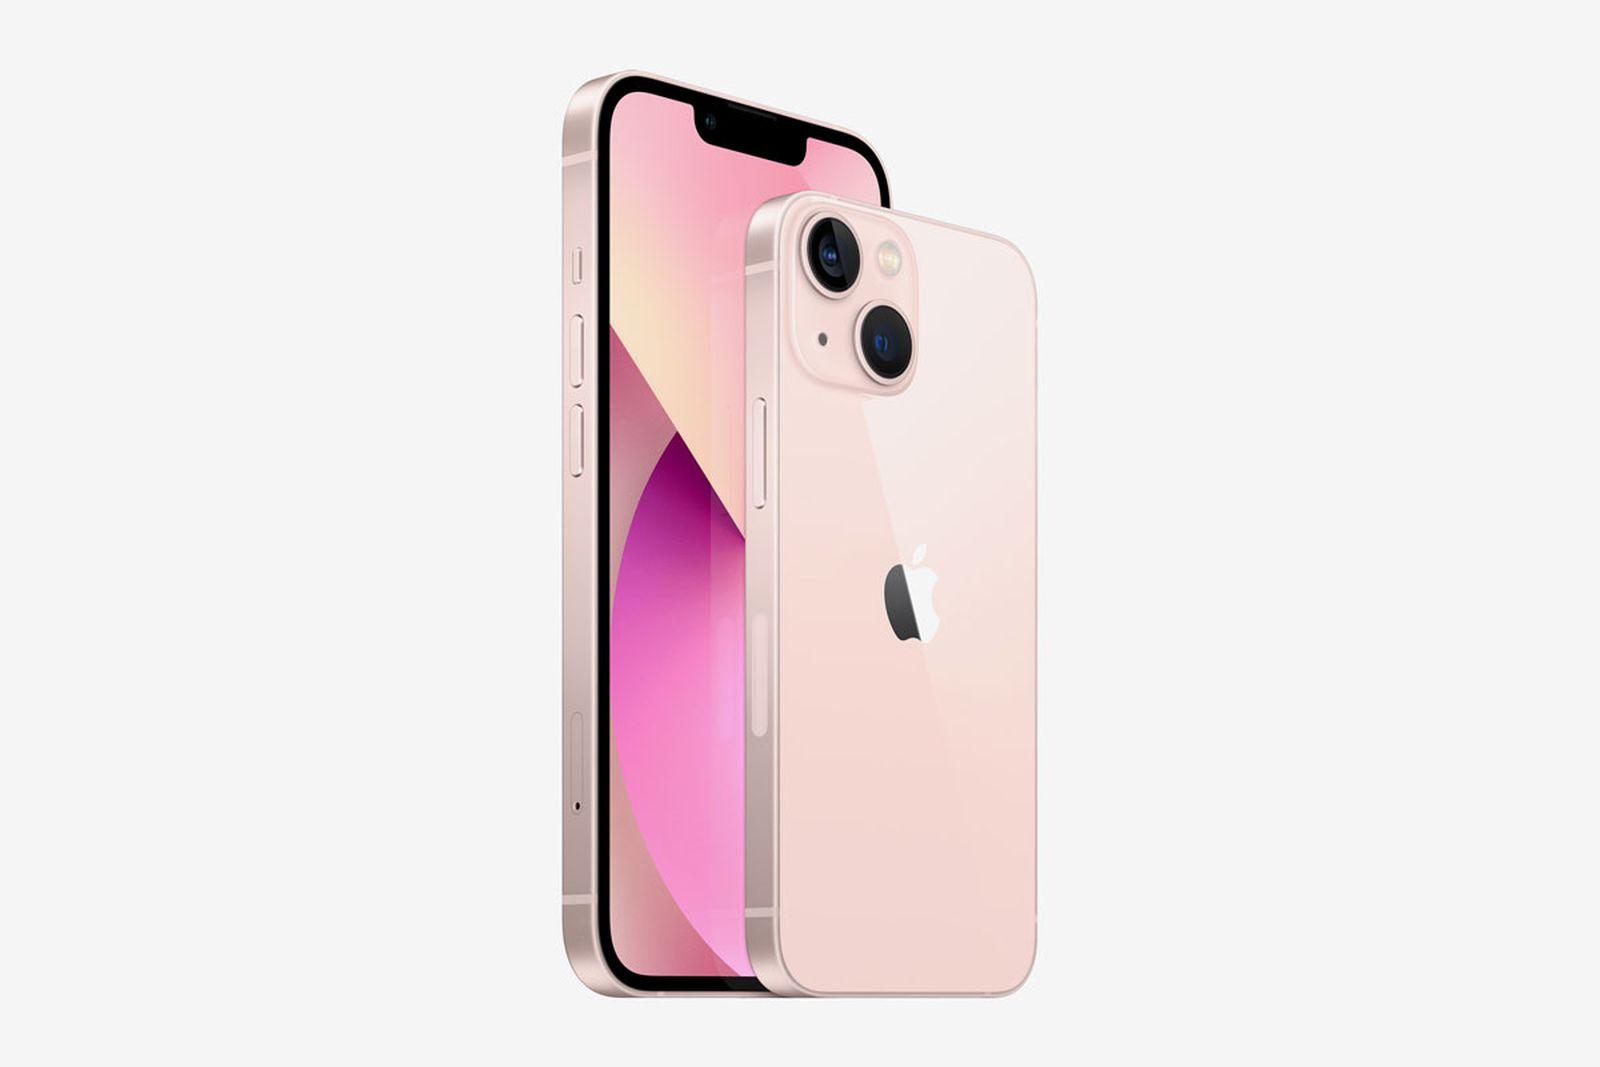 apple-iphone-13-pro-max-123